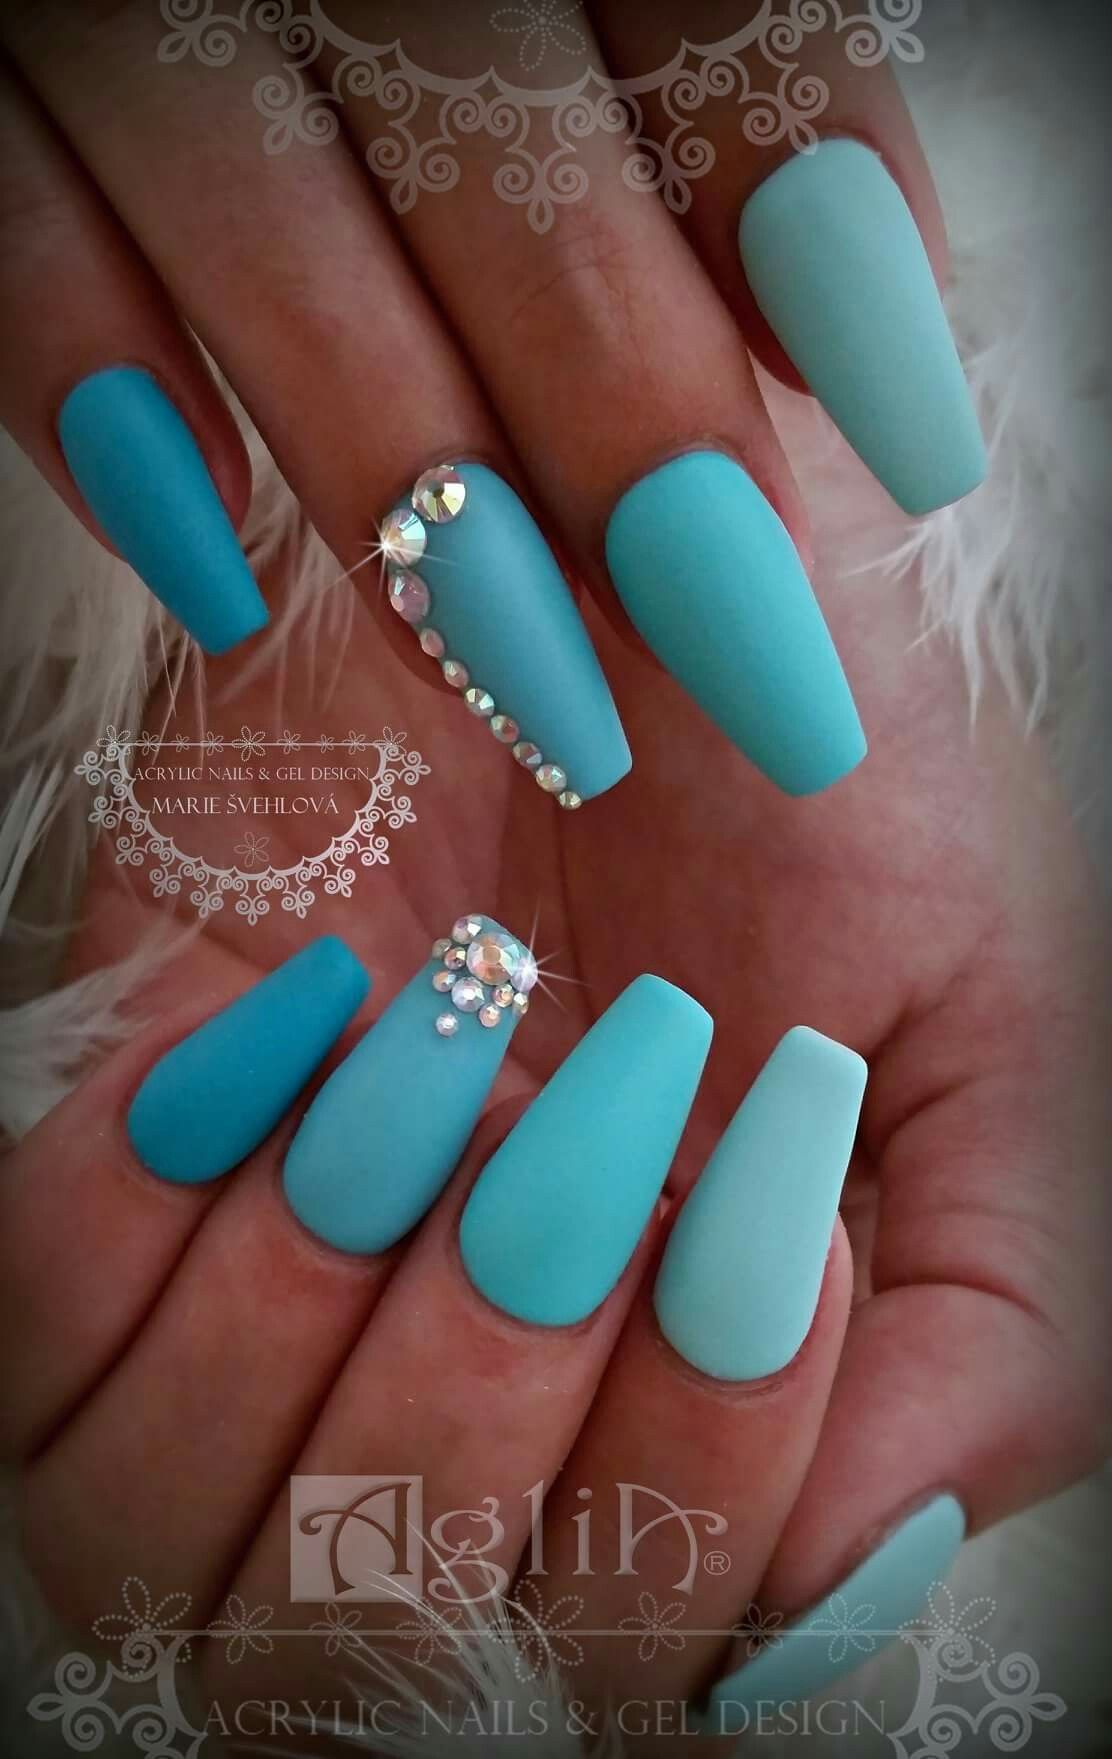 Acrylic Nails Gel Design Matte Nails